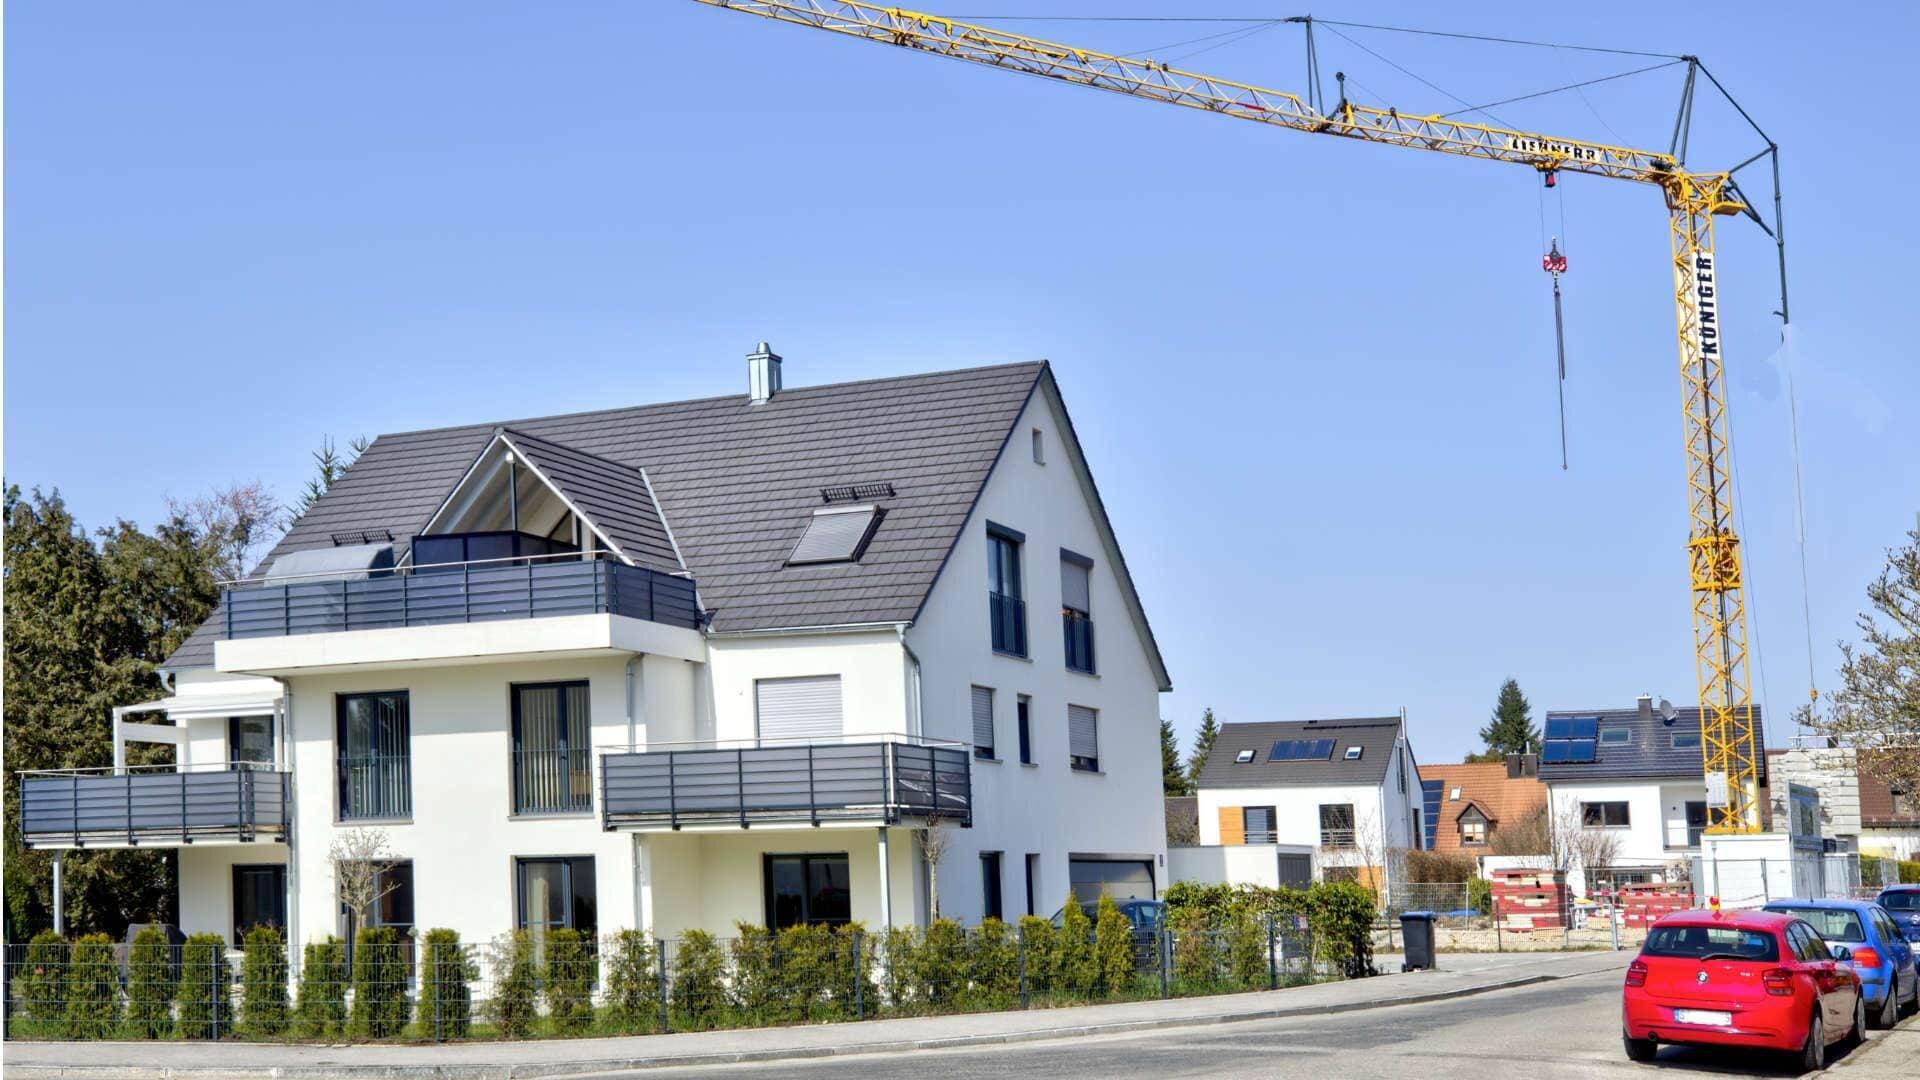 Hausverkauf an Nachbarn